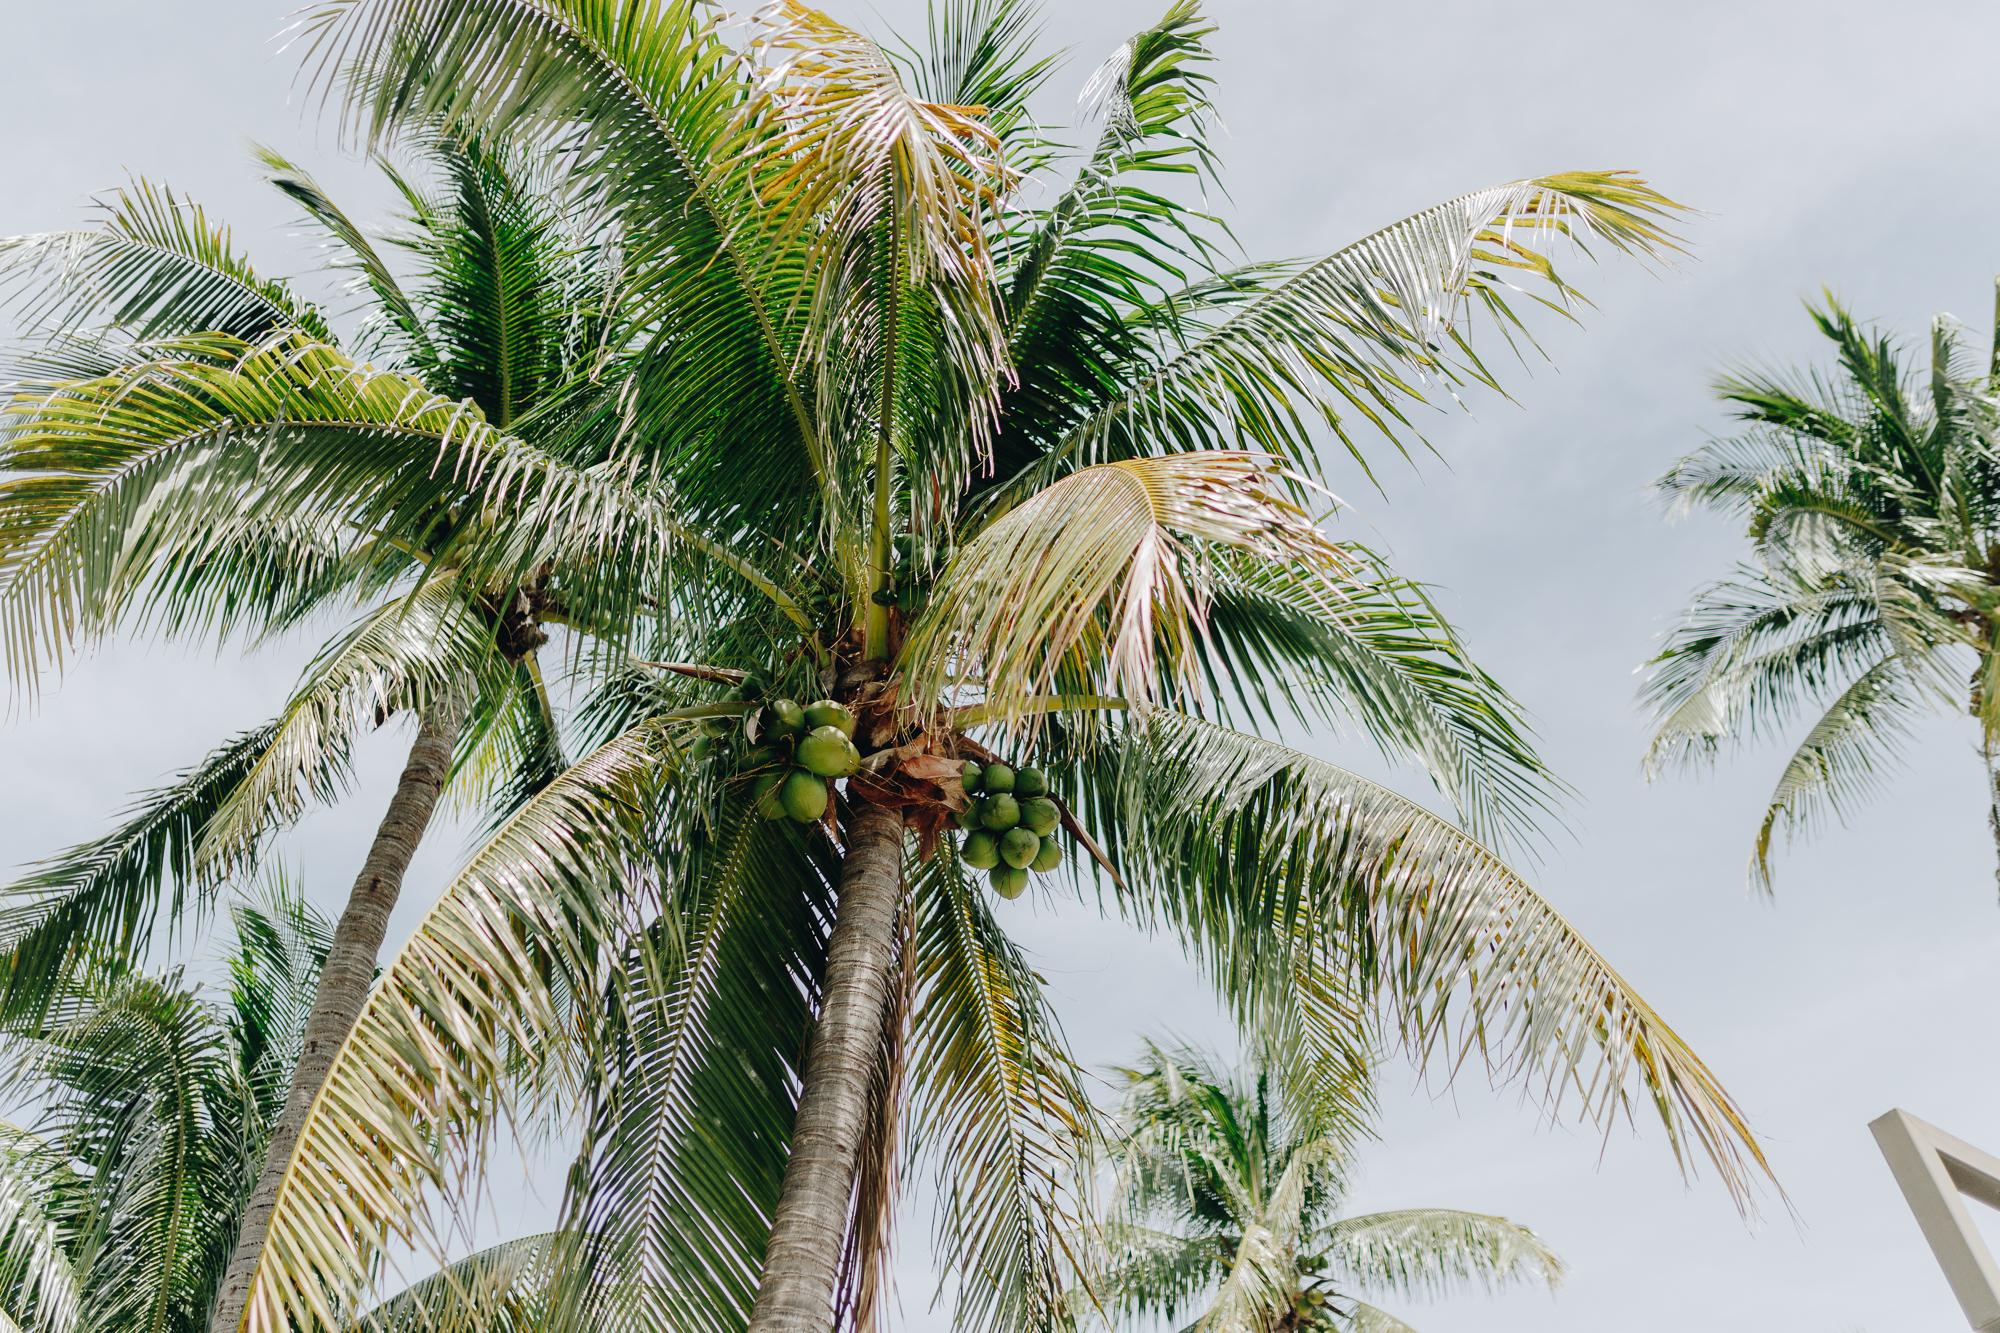 How to take great honeymoon photos